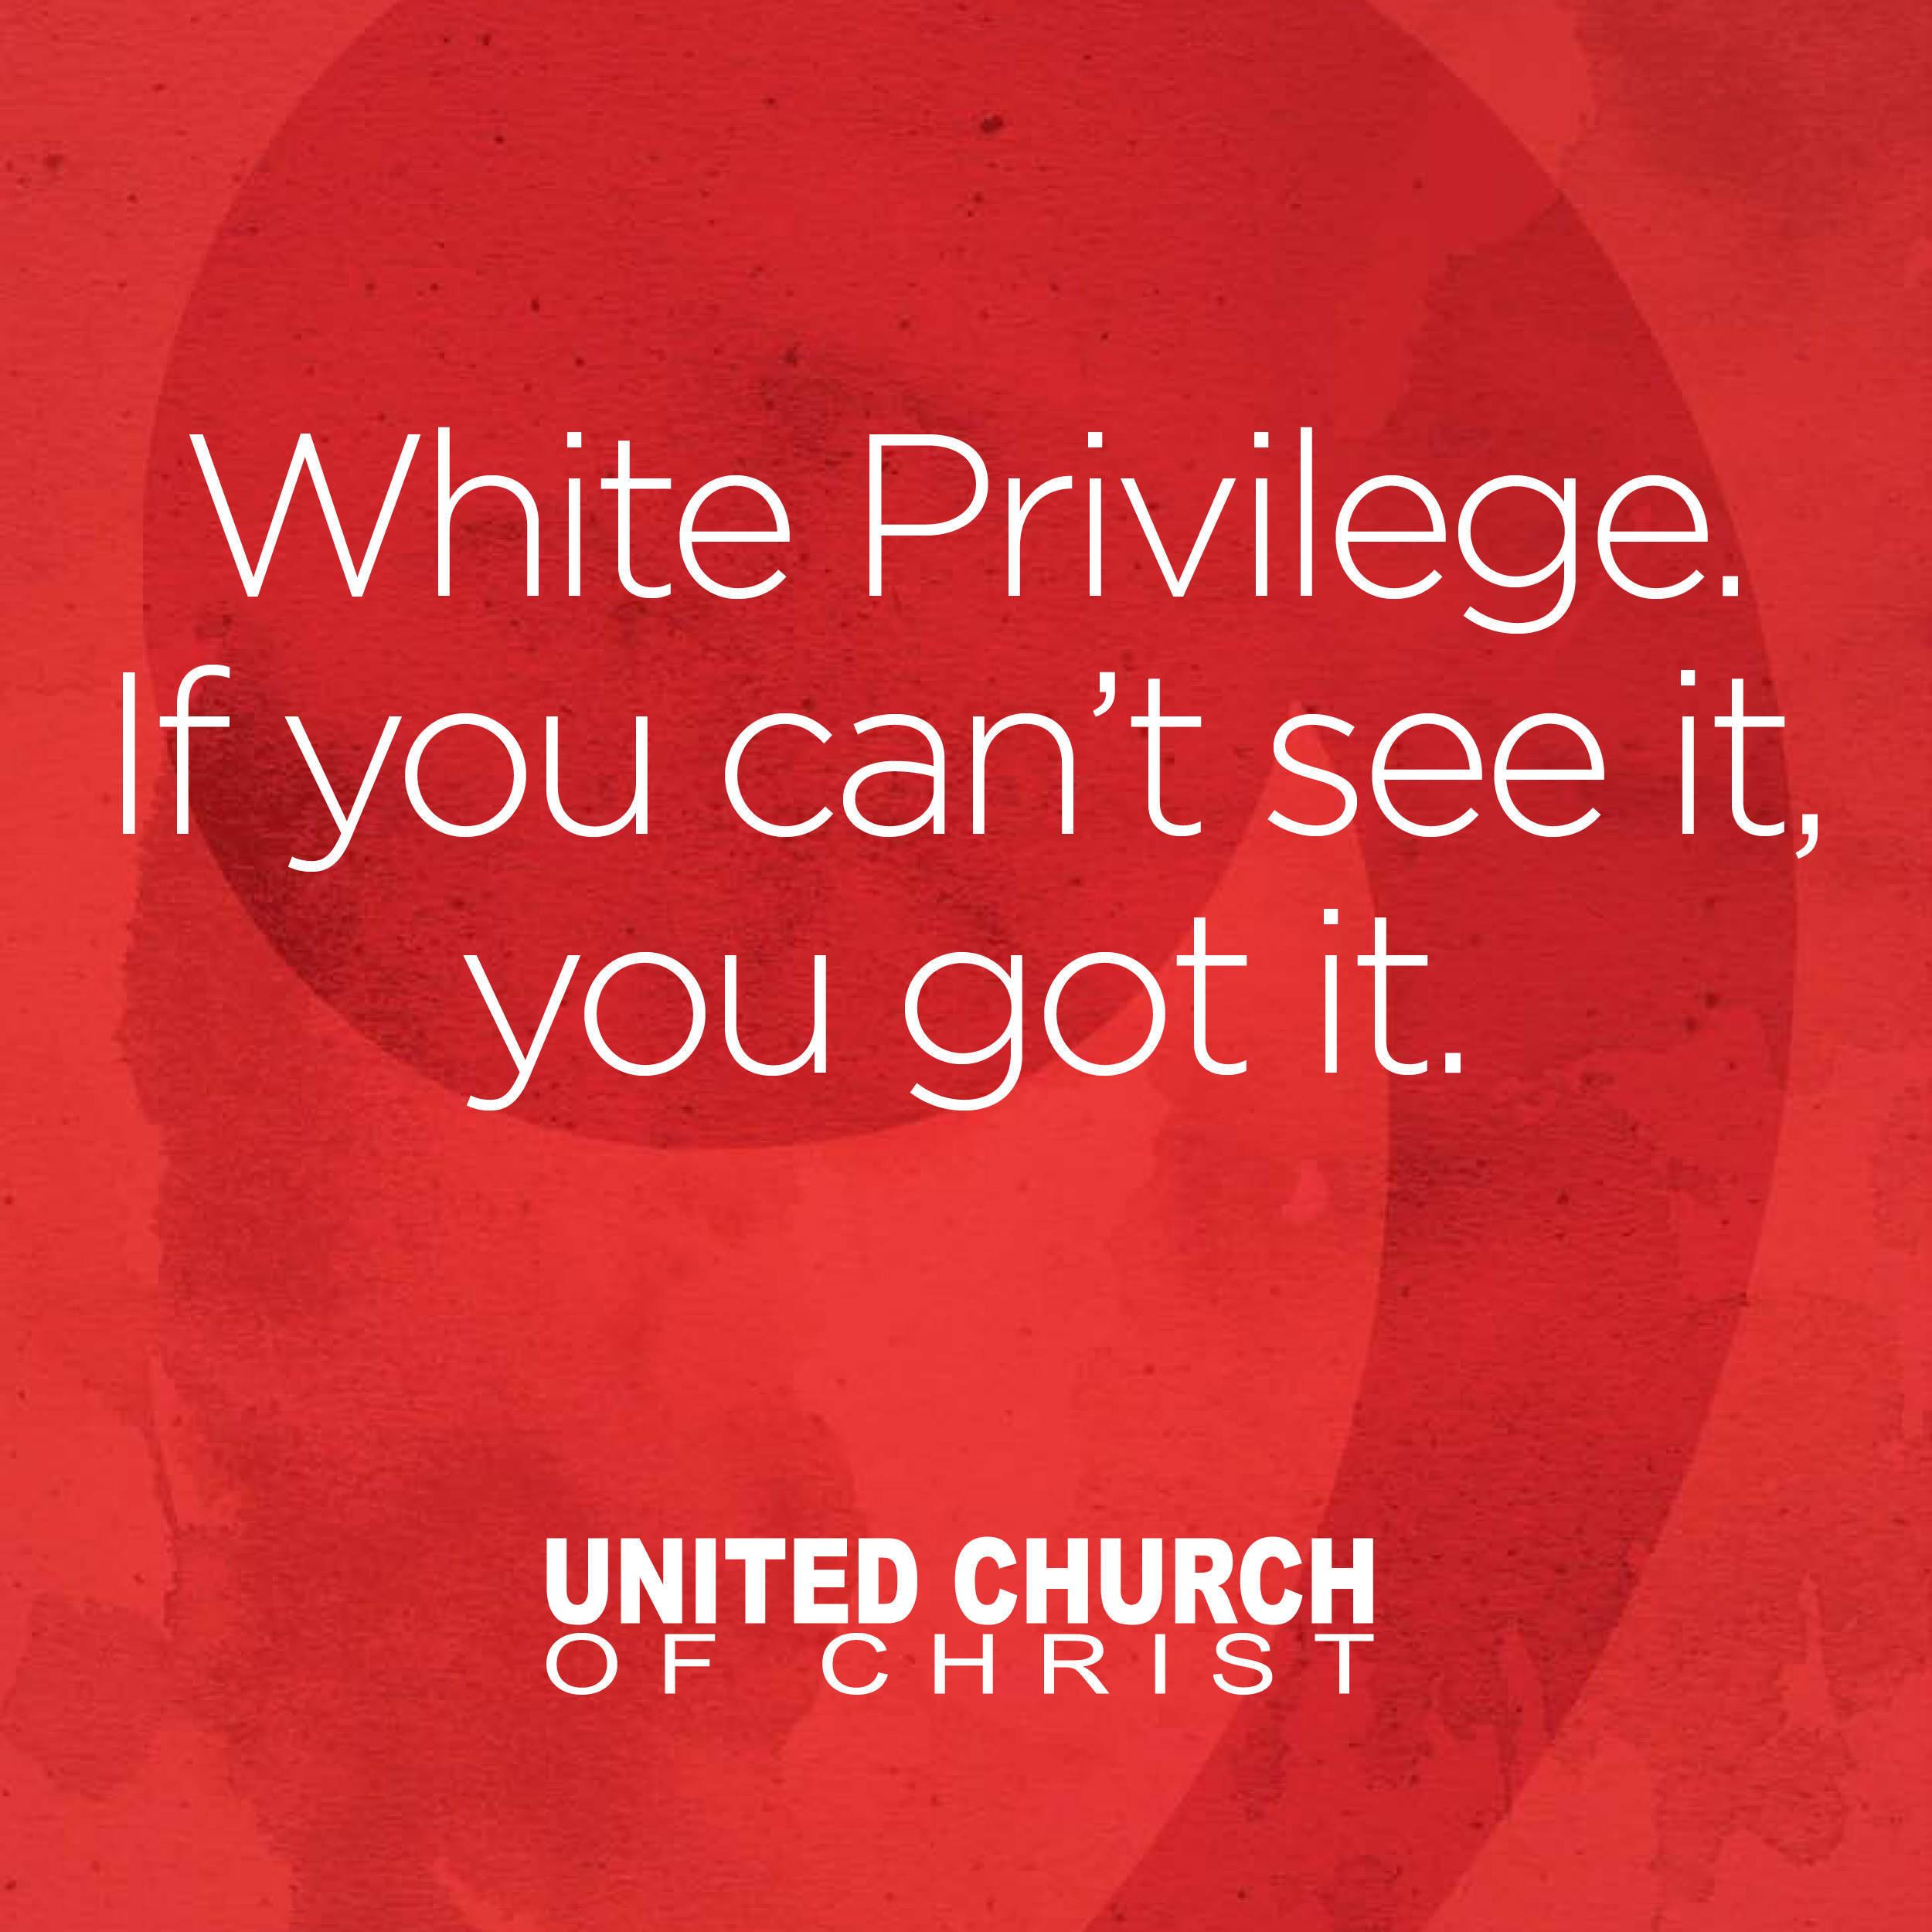 fd835d8c04080dfa49d6_White-Privilege.jpg